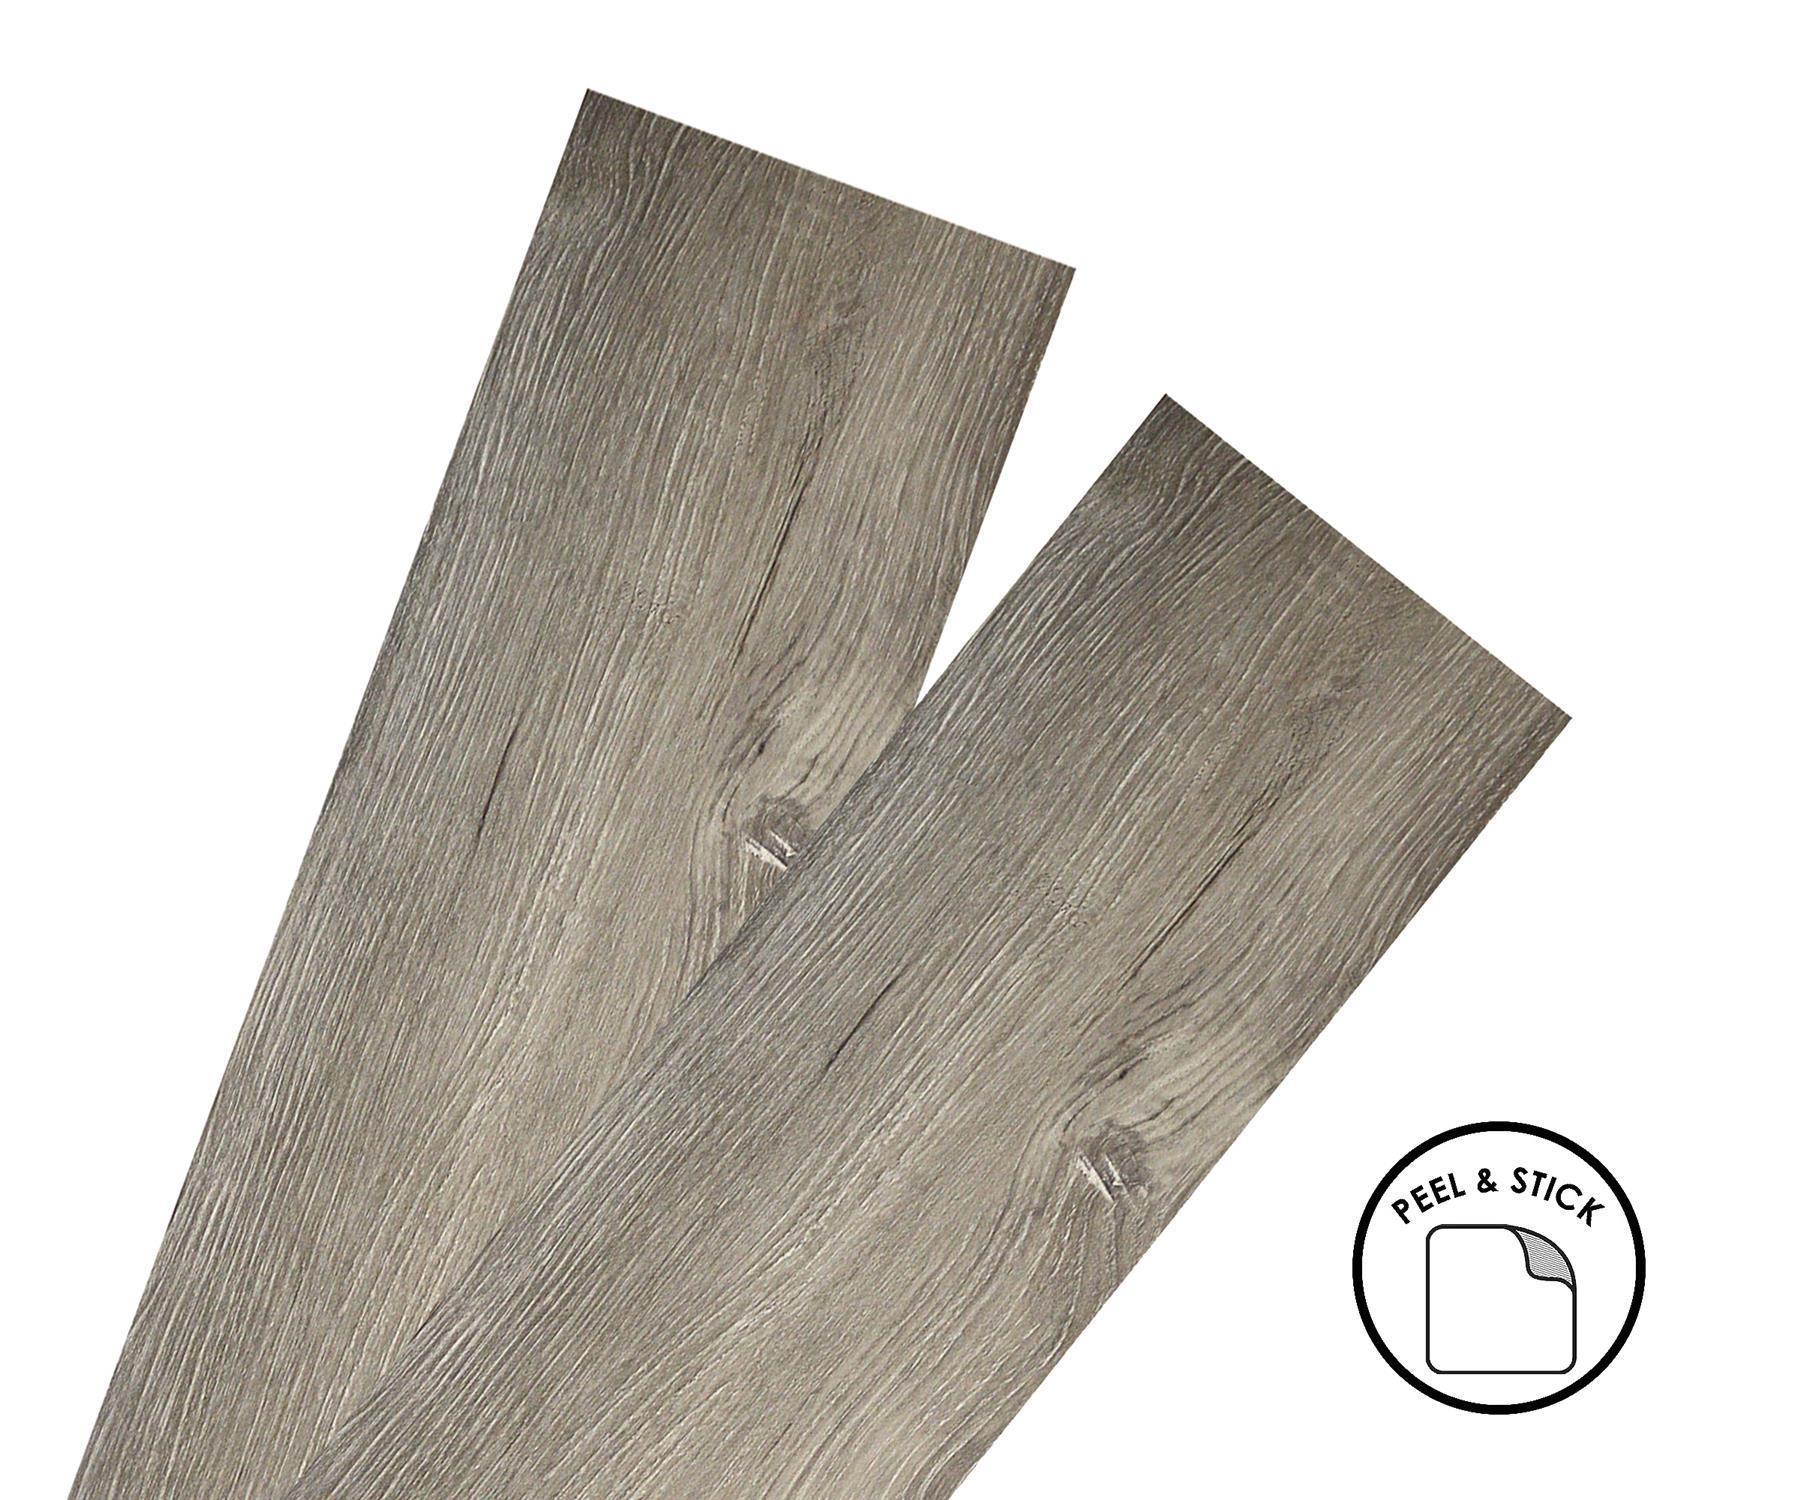 thumbnail 23 - Floor Planks Tiles Self Adhesive Dark Grey Wood Vinyl Flooring Kitchen Bathroom